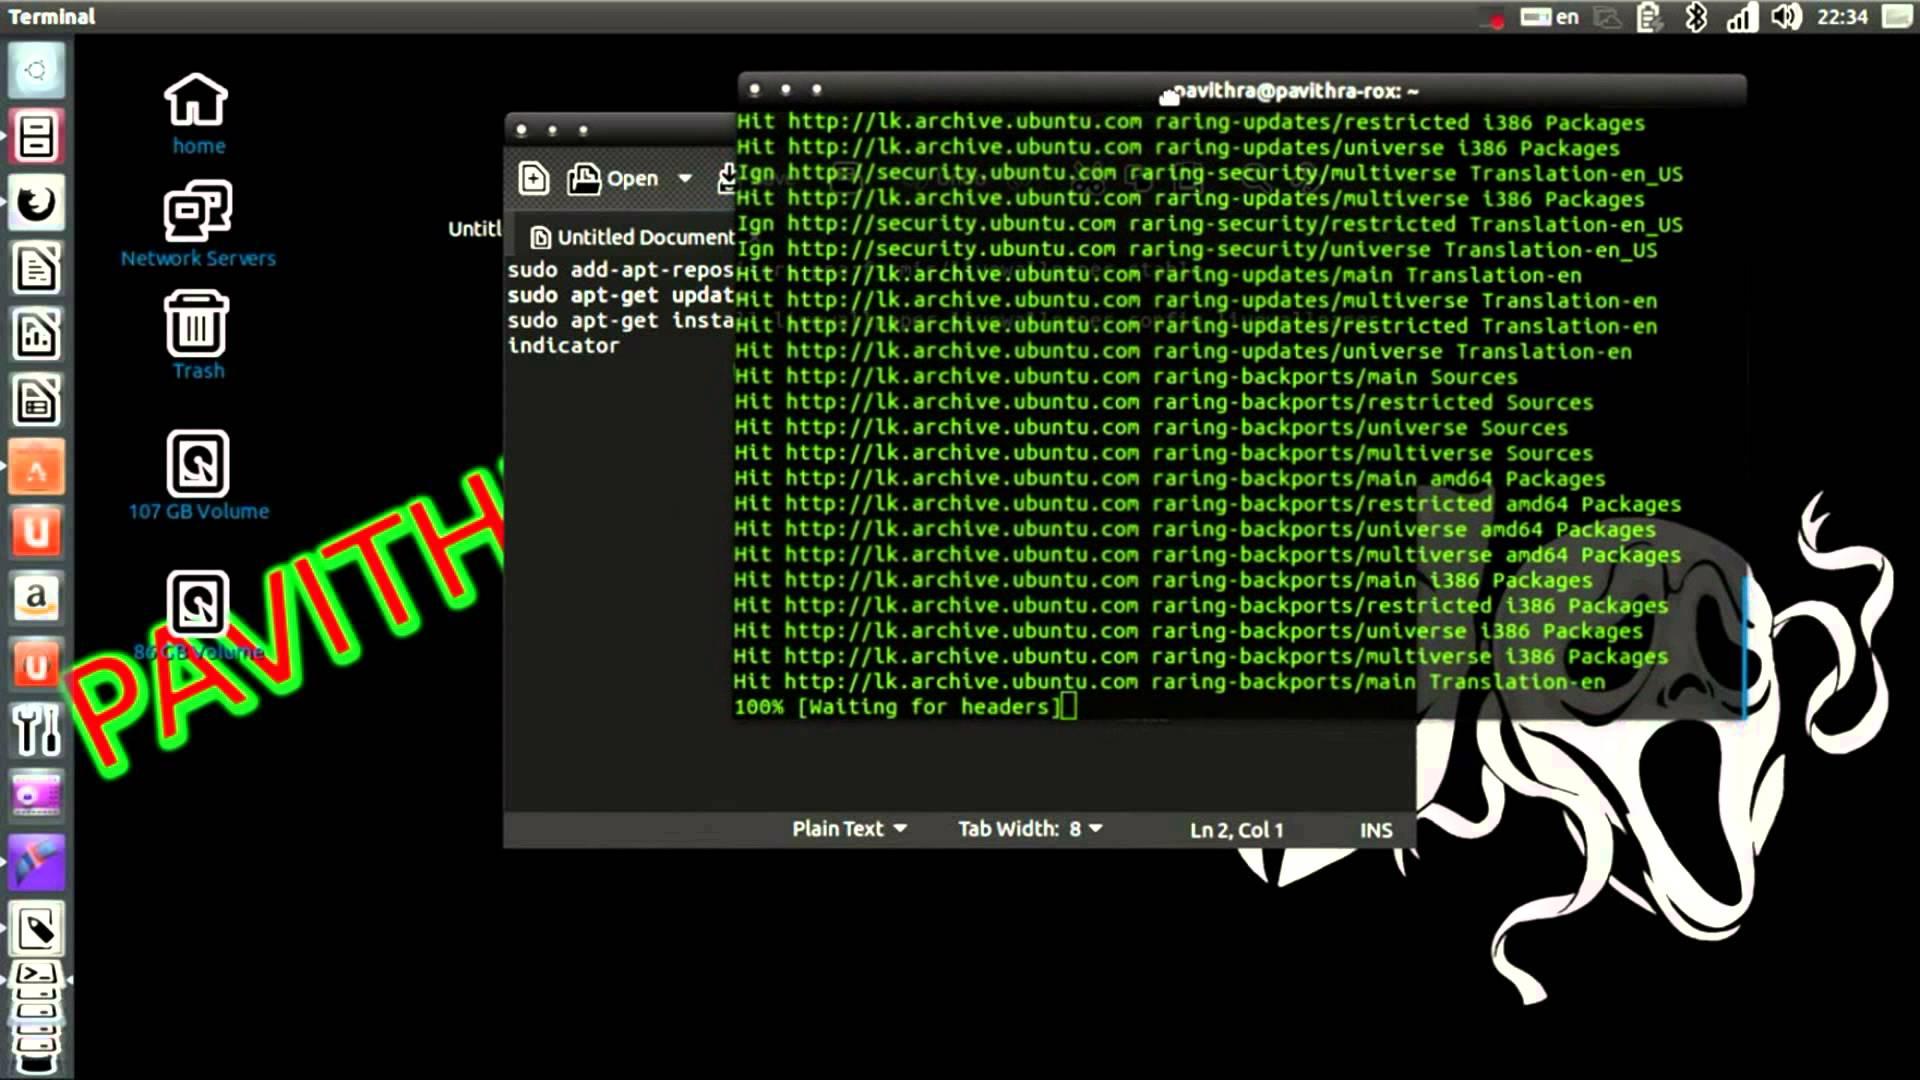 install live wallpapers on ubuntu120412101304 1920x1080